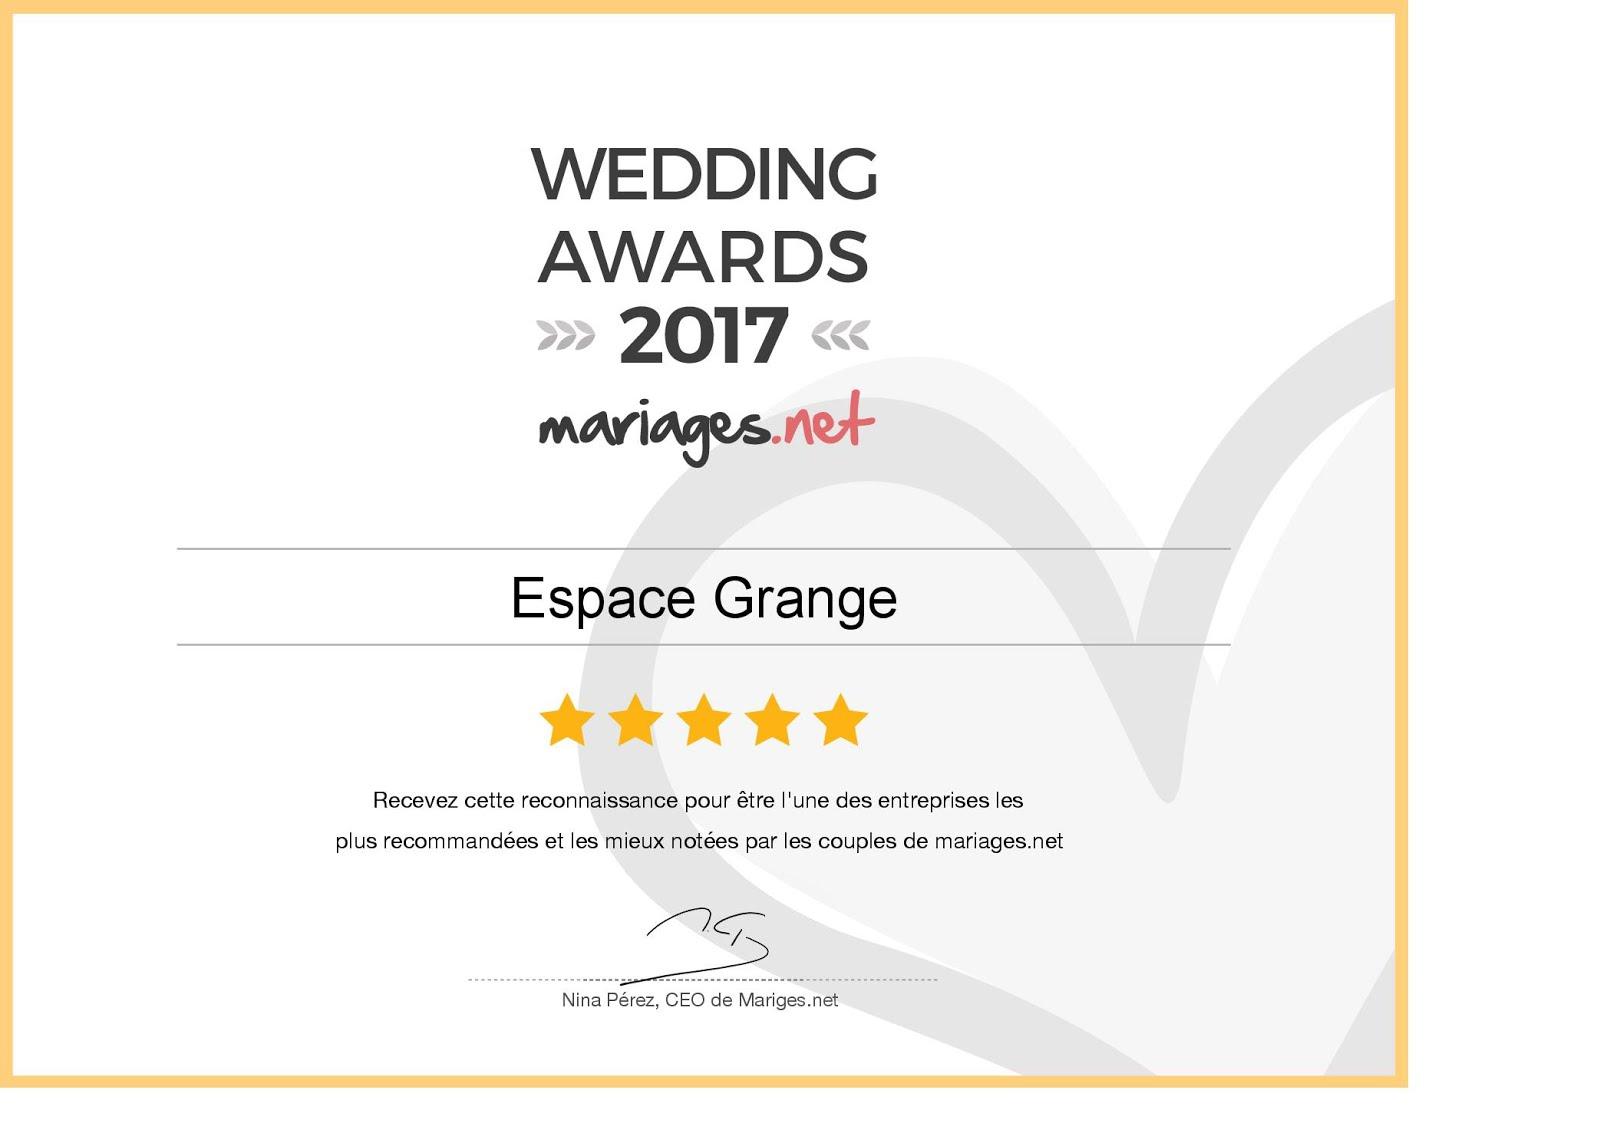 AWARDS 2017 - MARIAGE.NET